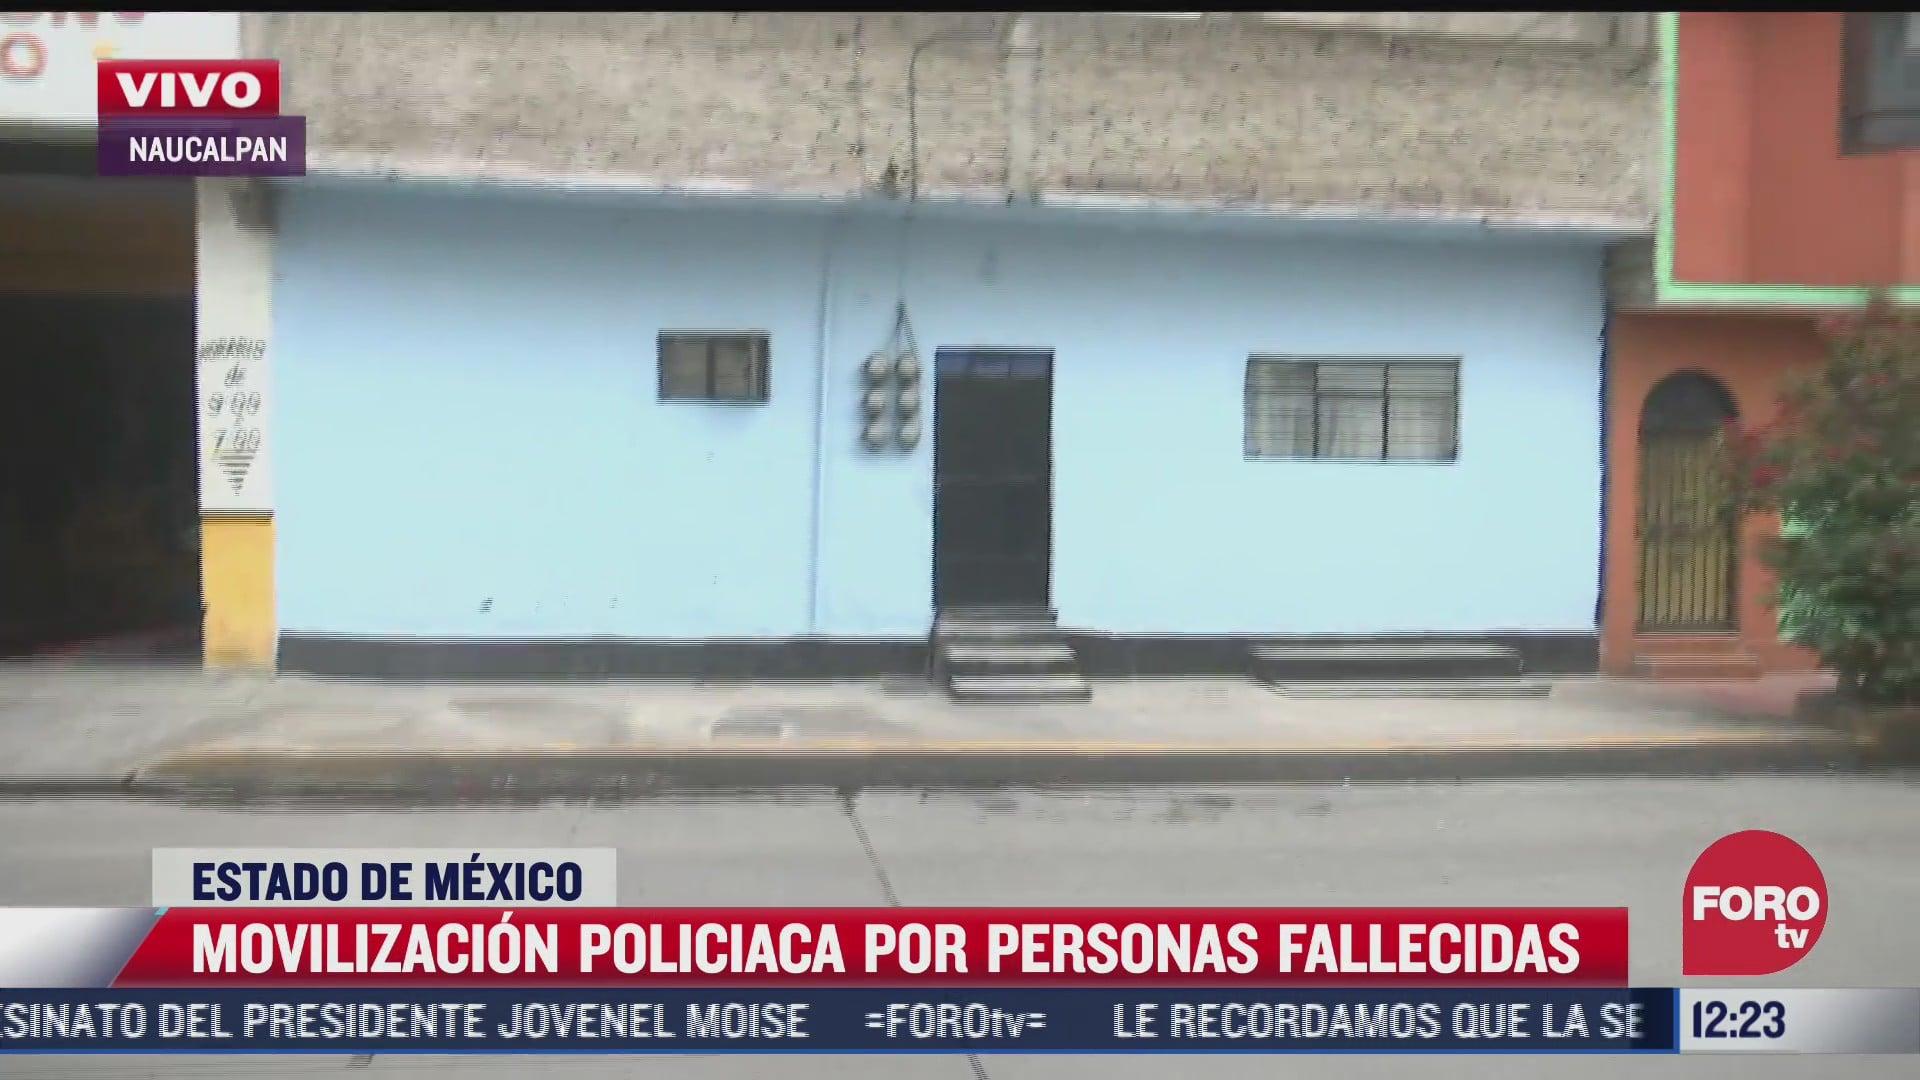 movilizacion policiaca por personas fallecidas en naucalpan estado de mexico